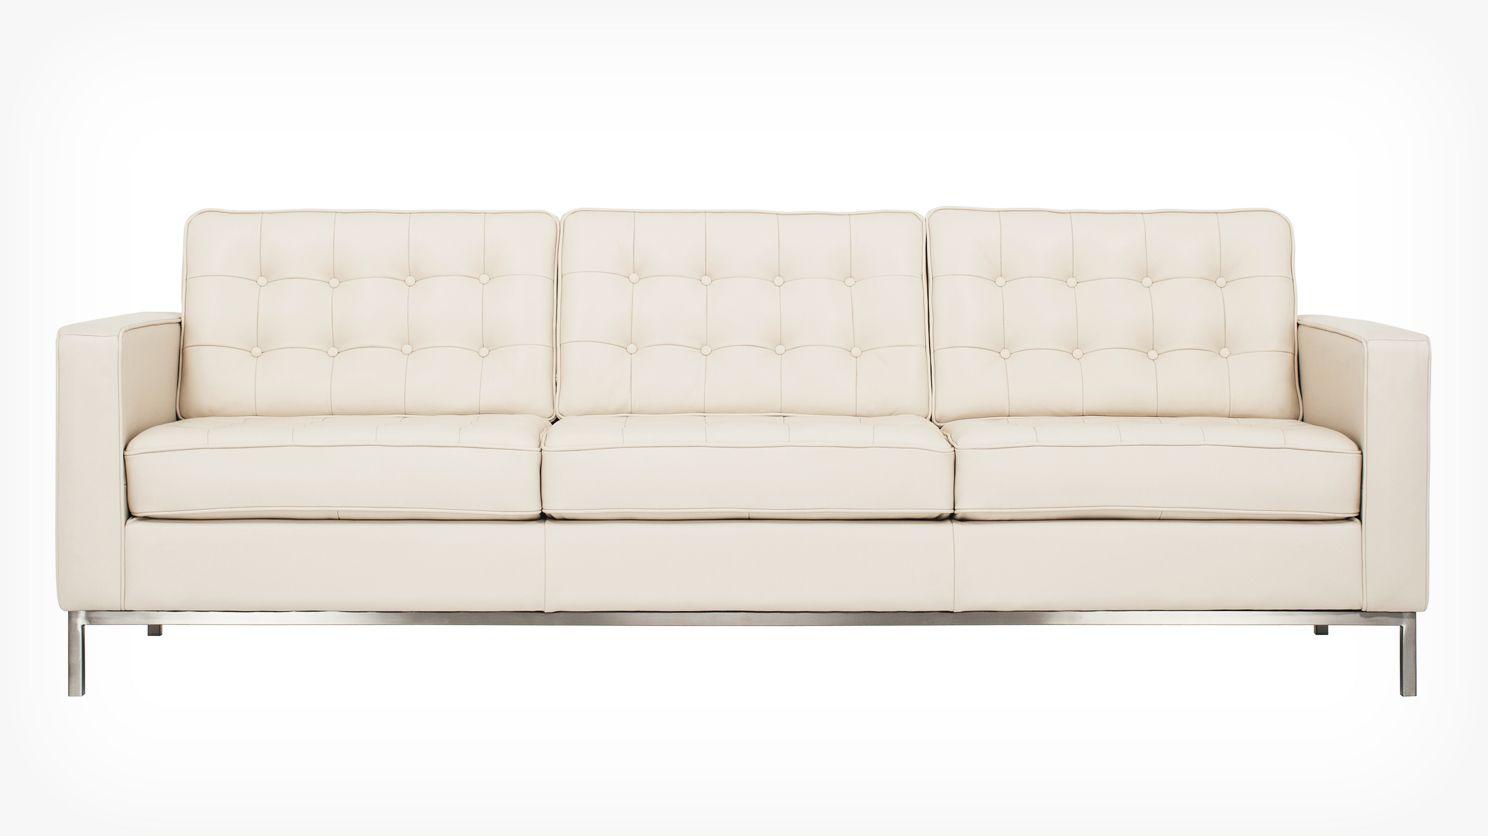 Reverie 86 Sofa White Leather Sofas Leather Sofa Sofa